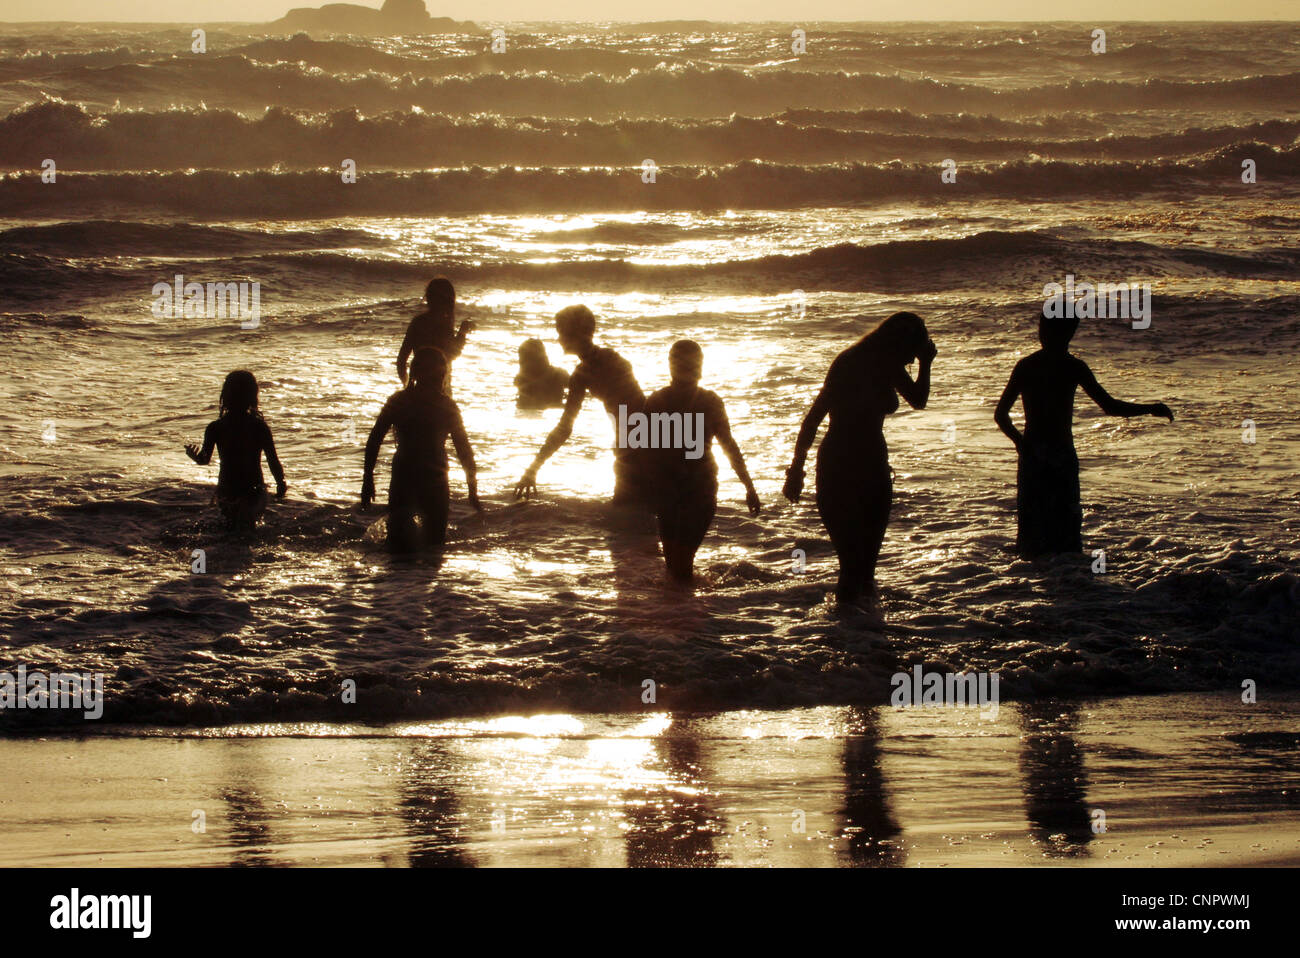 sri-lanka-sunset-children-playing-in-the-waves-at-sunset-bentota-beach-CNPWMJ.jpg